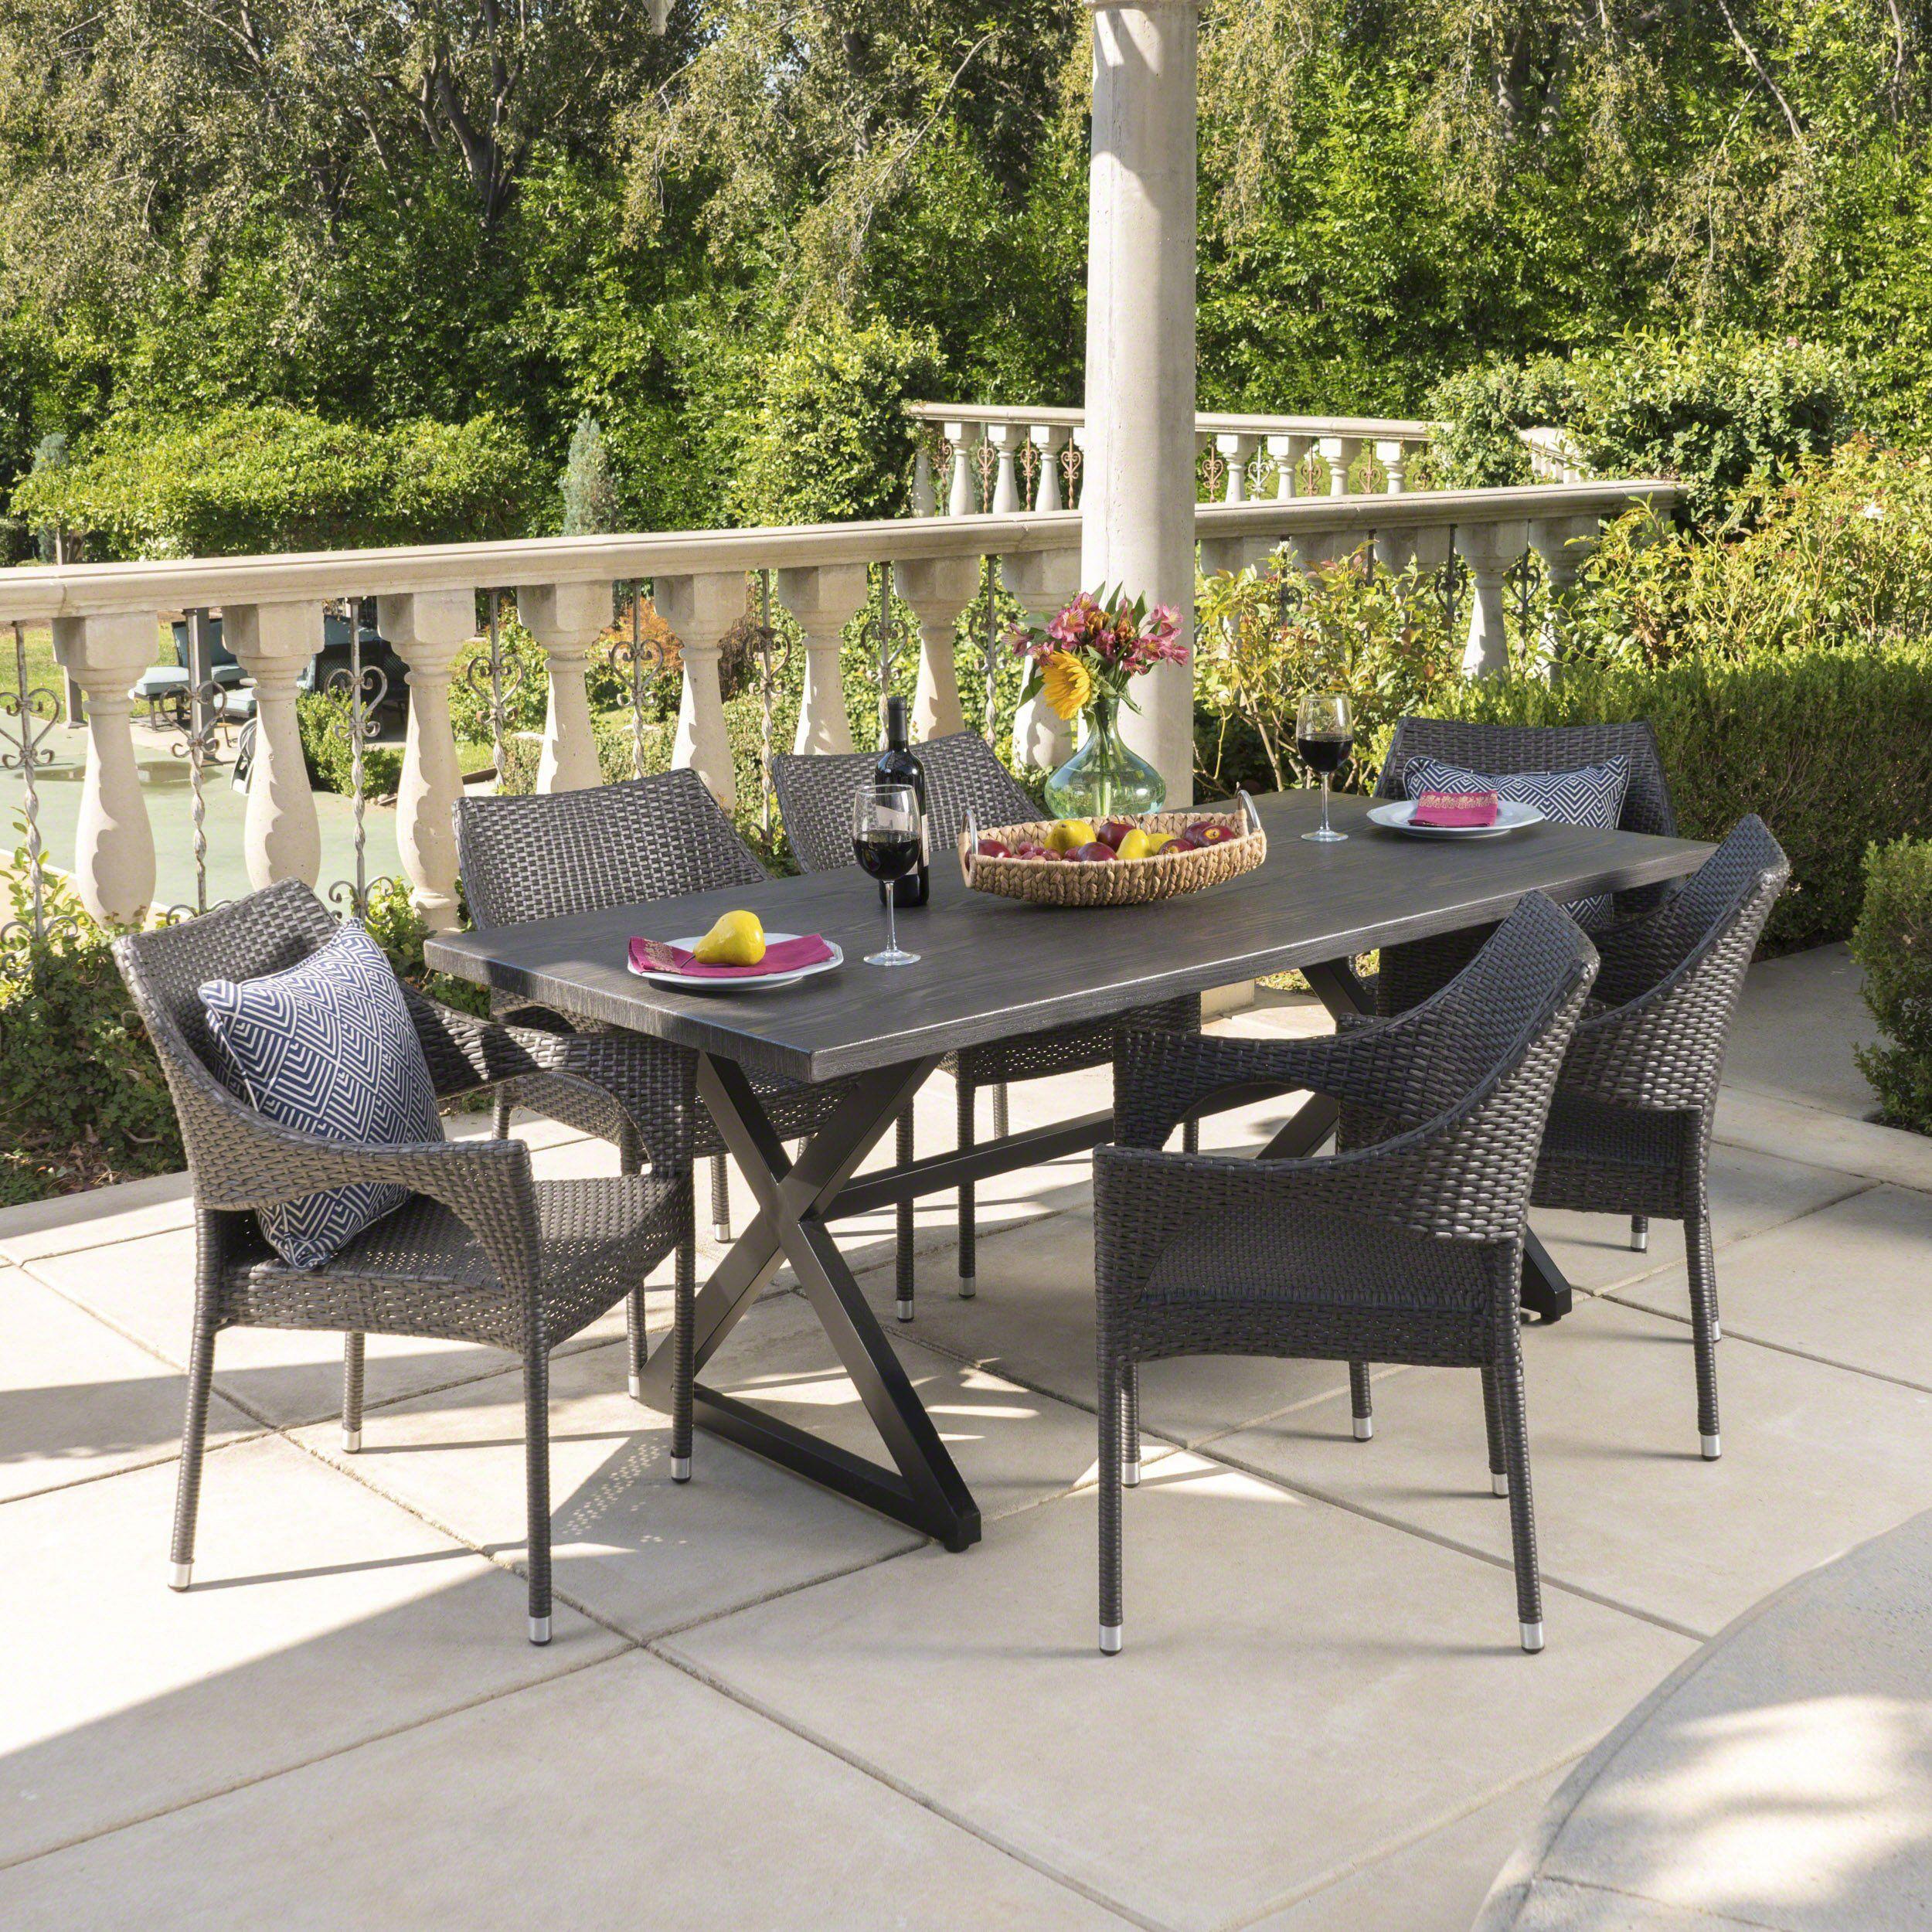 Graywood Outdoor 7 Piece Wicker Dining Set With Rectangular